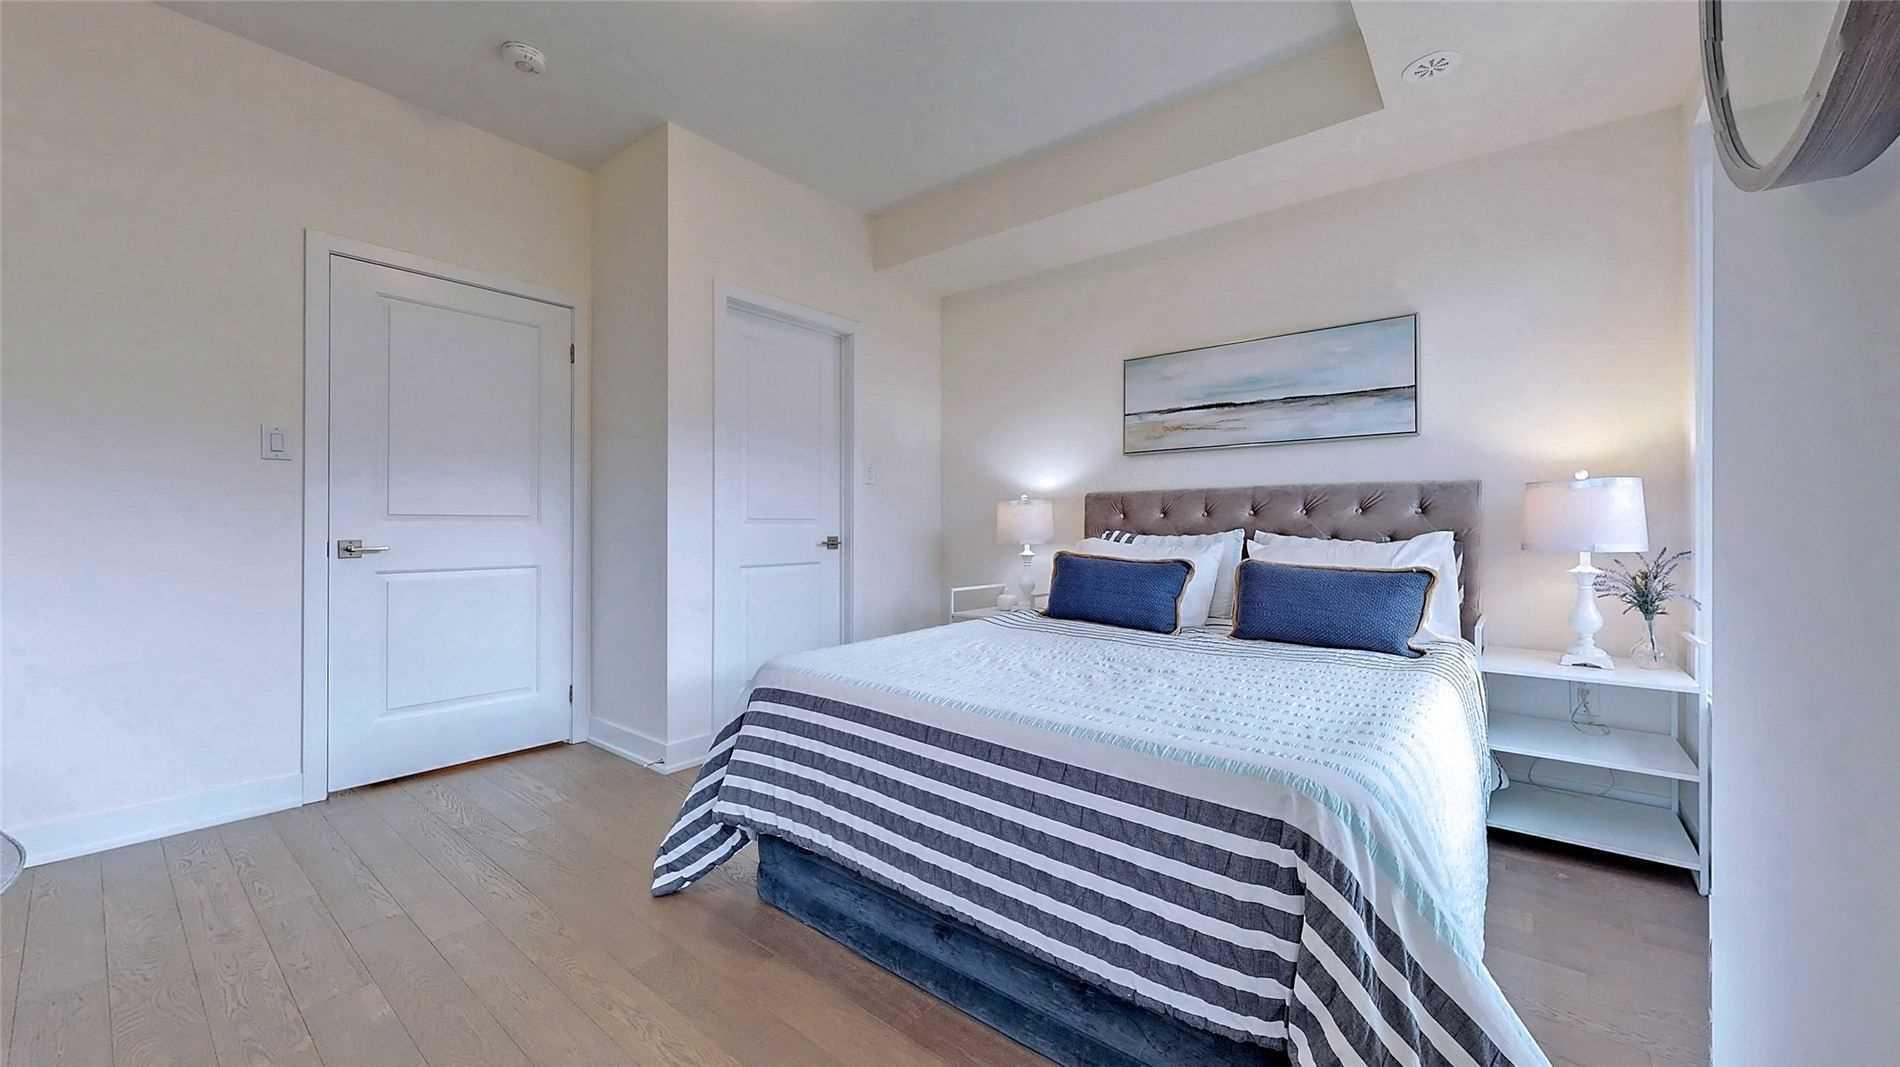 Att/row/twnhouse For Sale In Toronto , 5 Bedrooms Bedrooms, ,5 BathroomsBathrooms,Att/row/twnhouse,For Sale,William Duncan